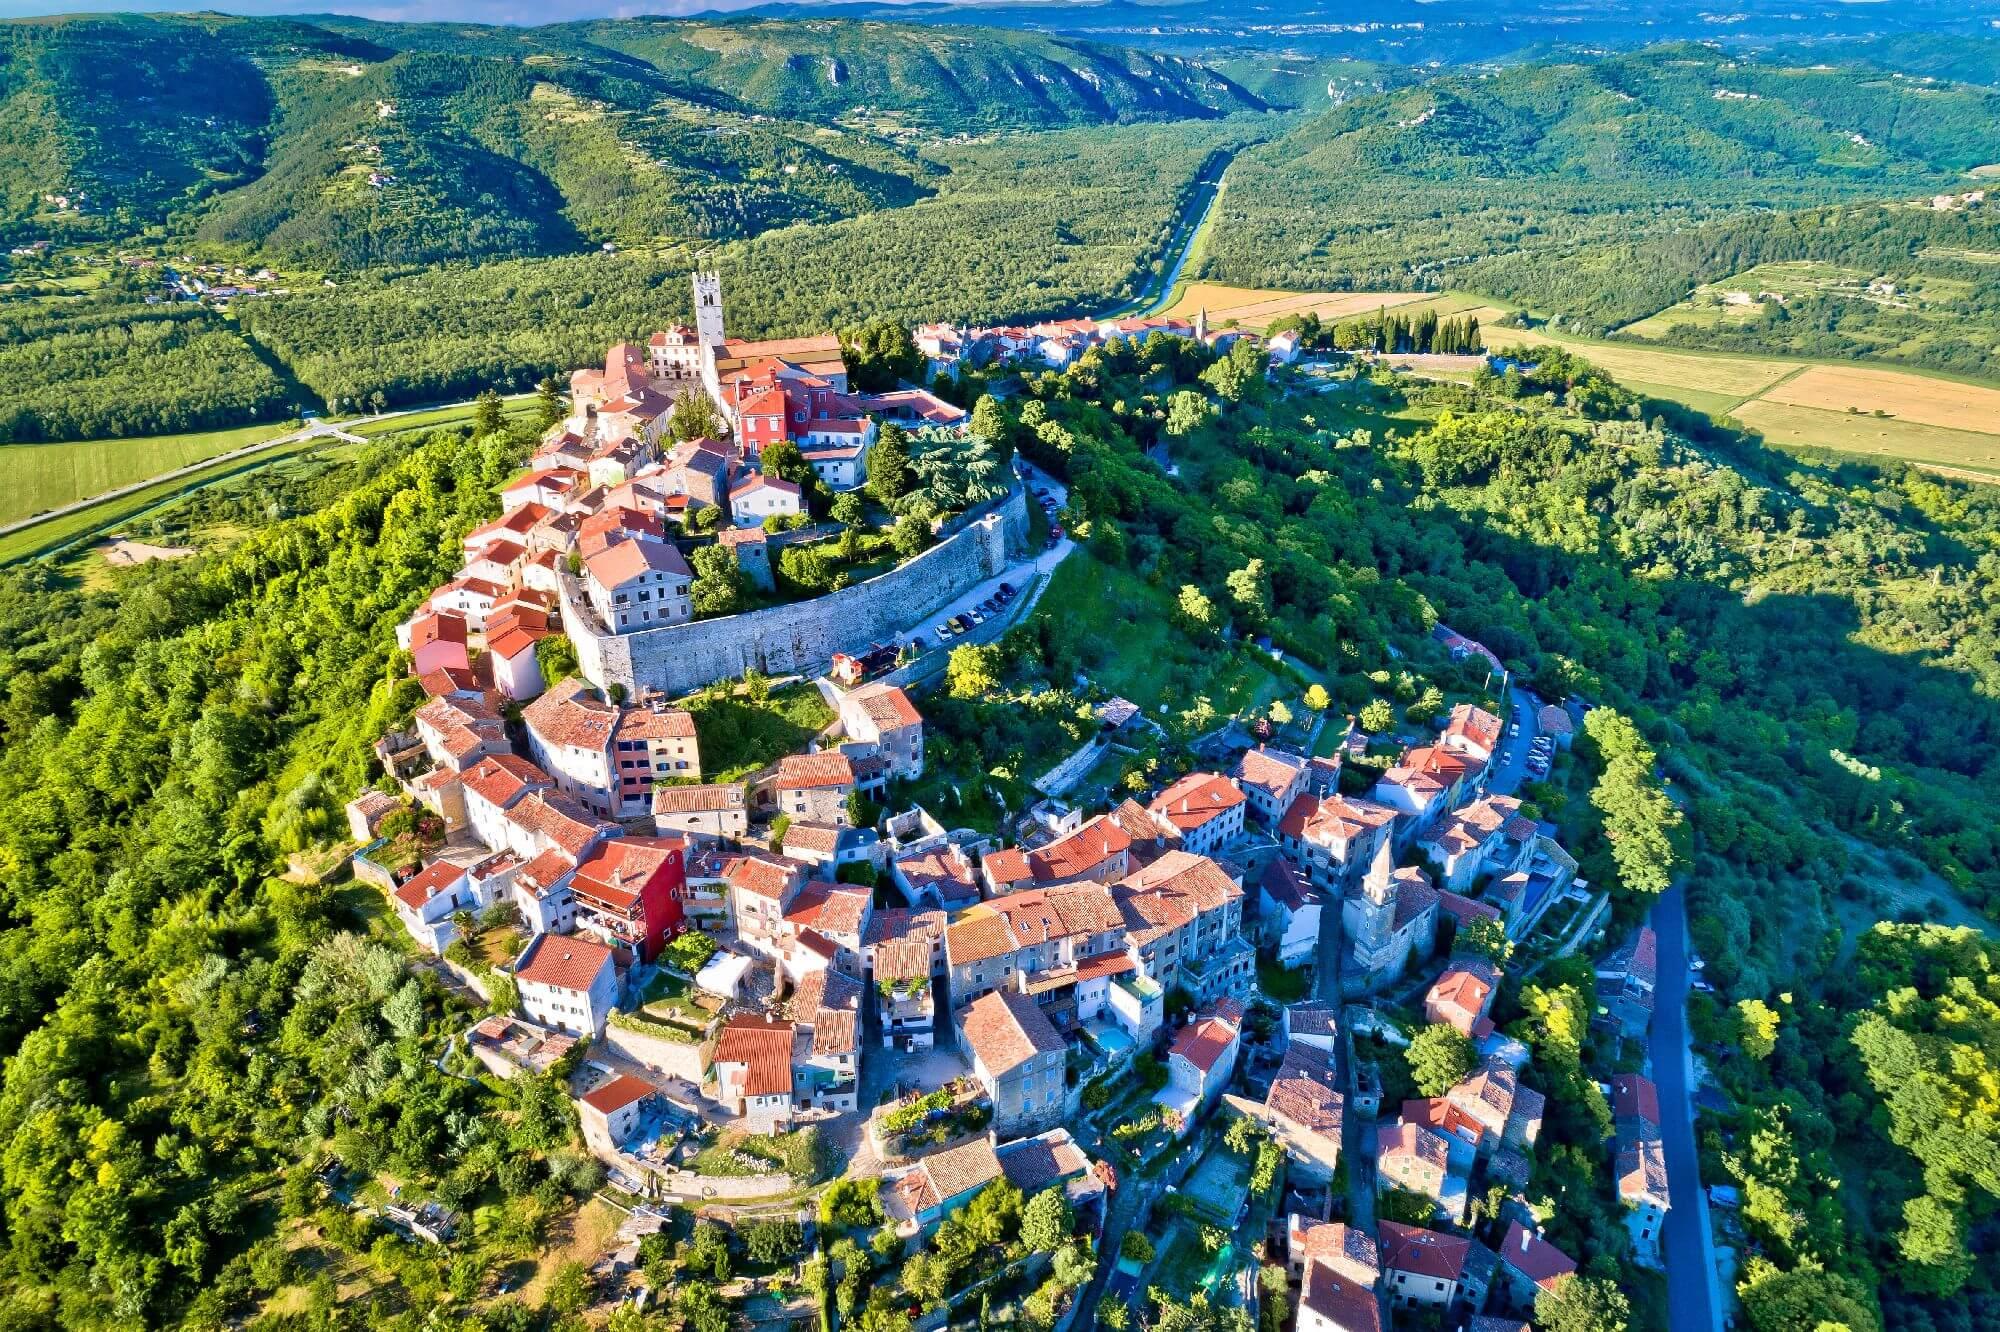 hill-town-of-motovun-croatia_5c2f6feaecb00.jpg